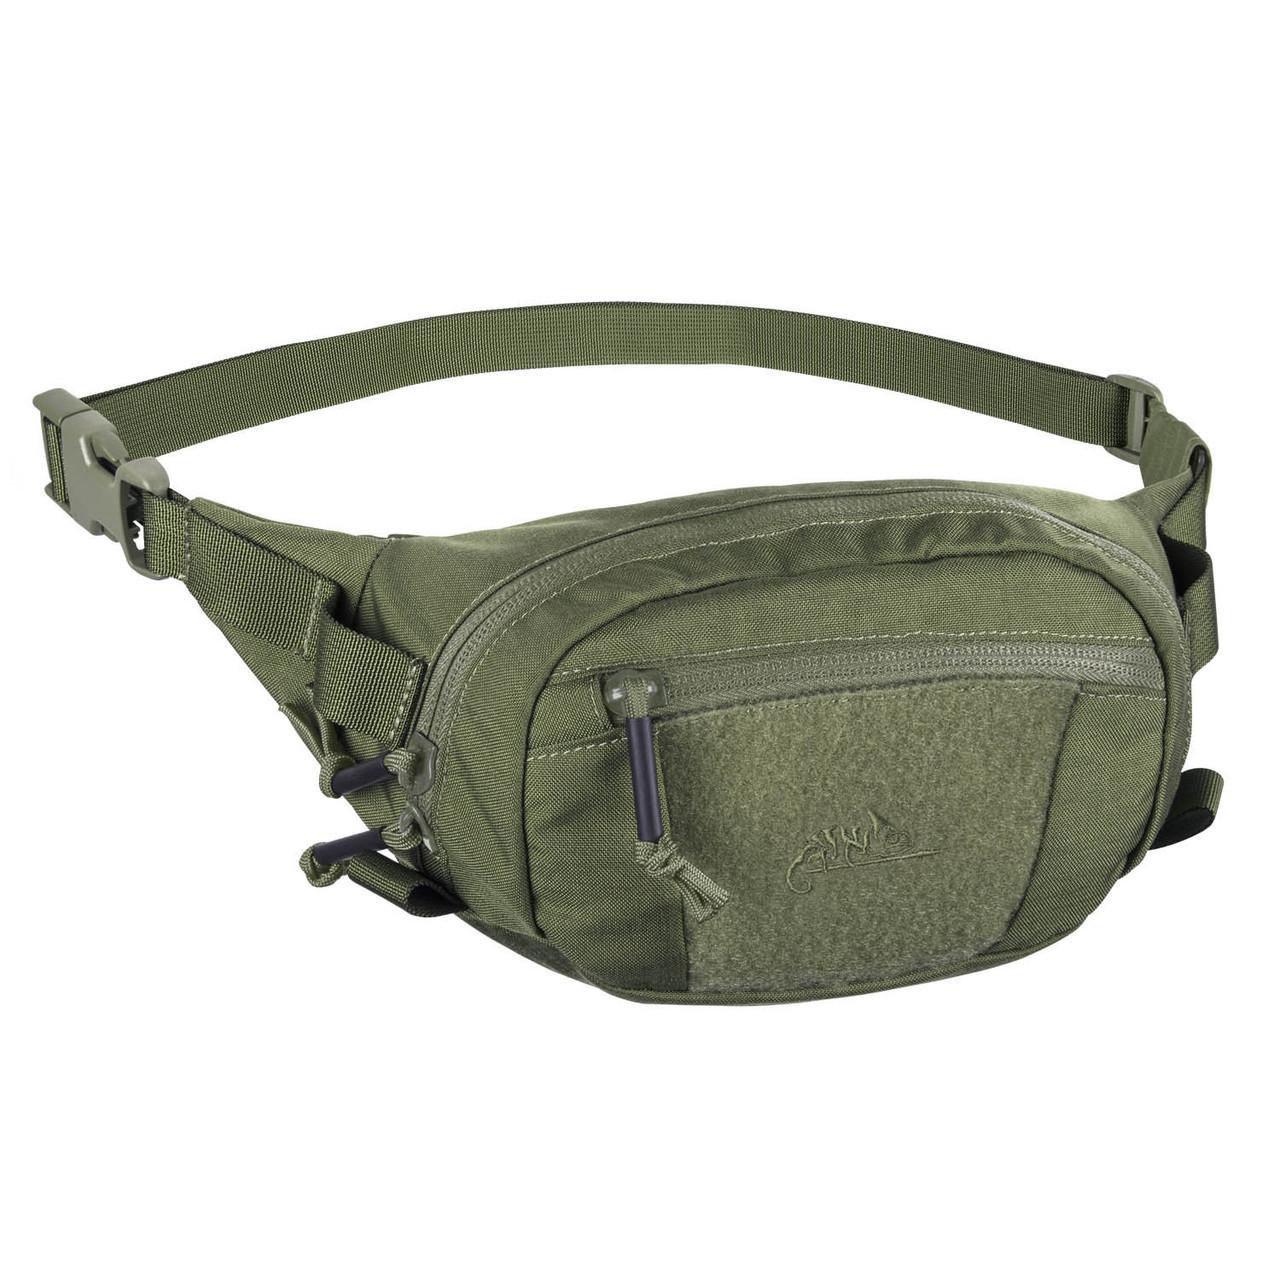 Сумка поясная Helikon-Tex® POSSUM® Waist Pack - Cordura® - Олива